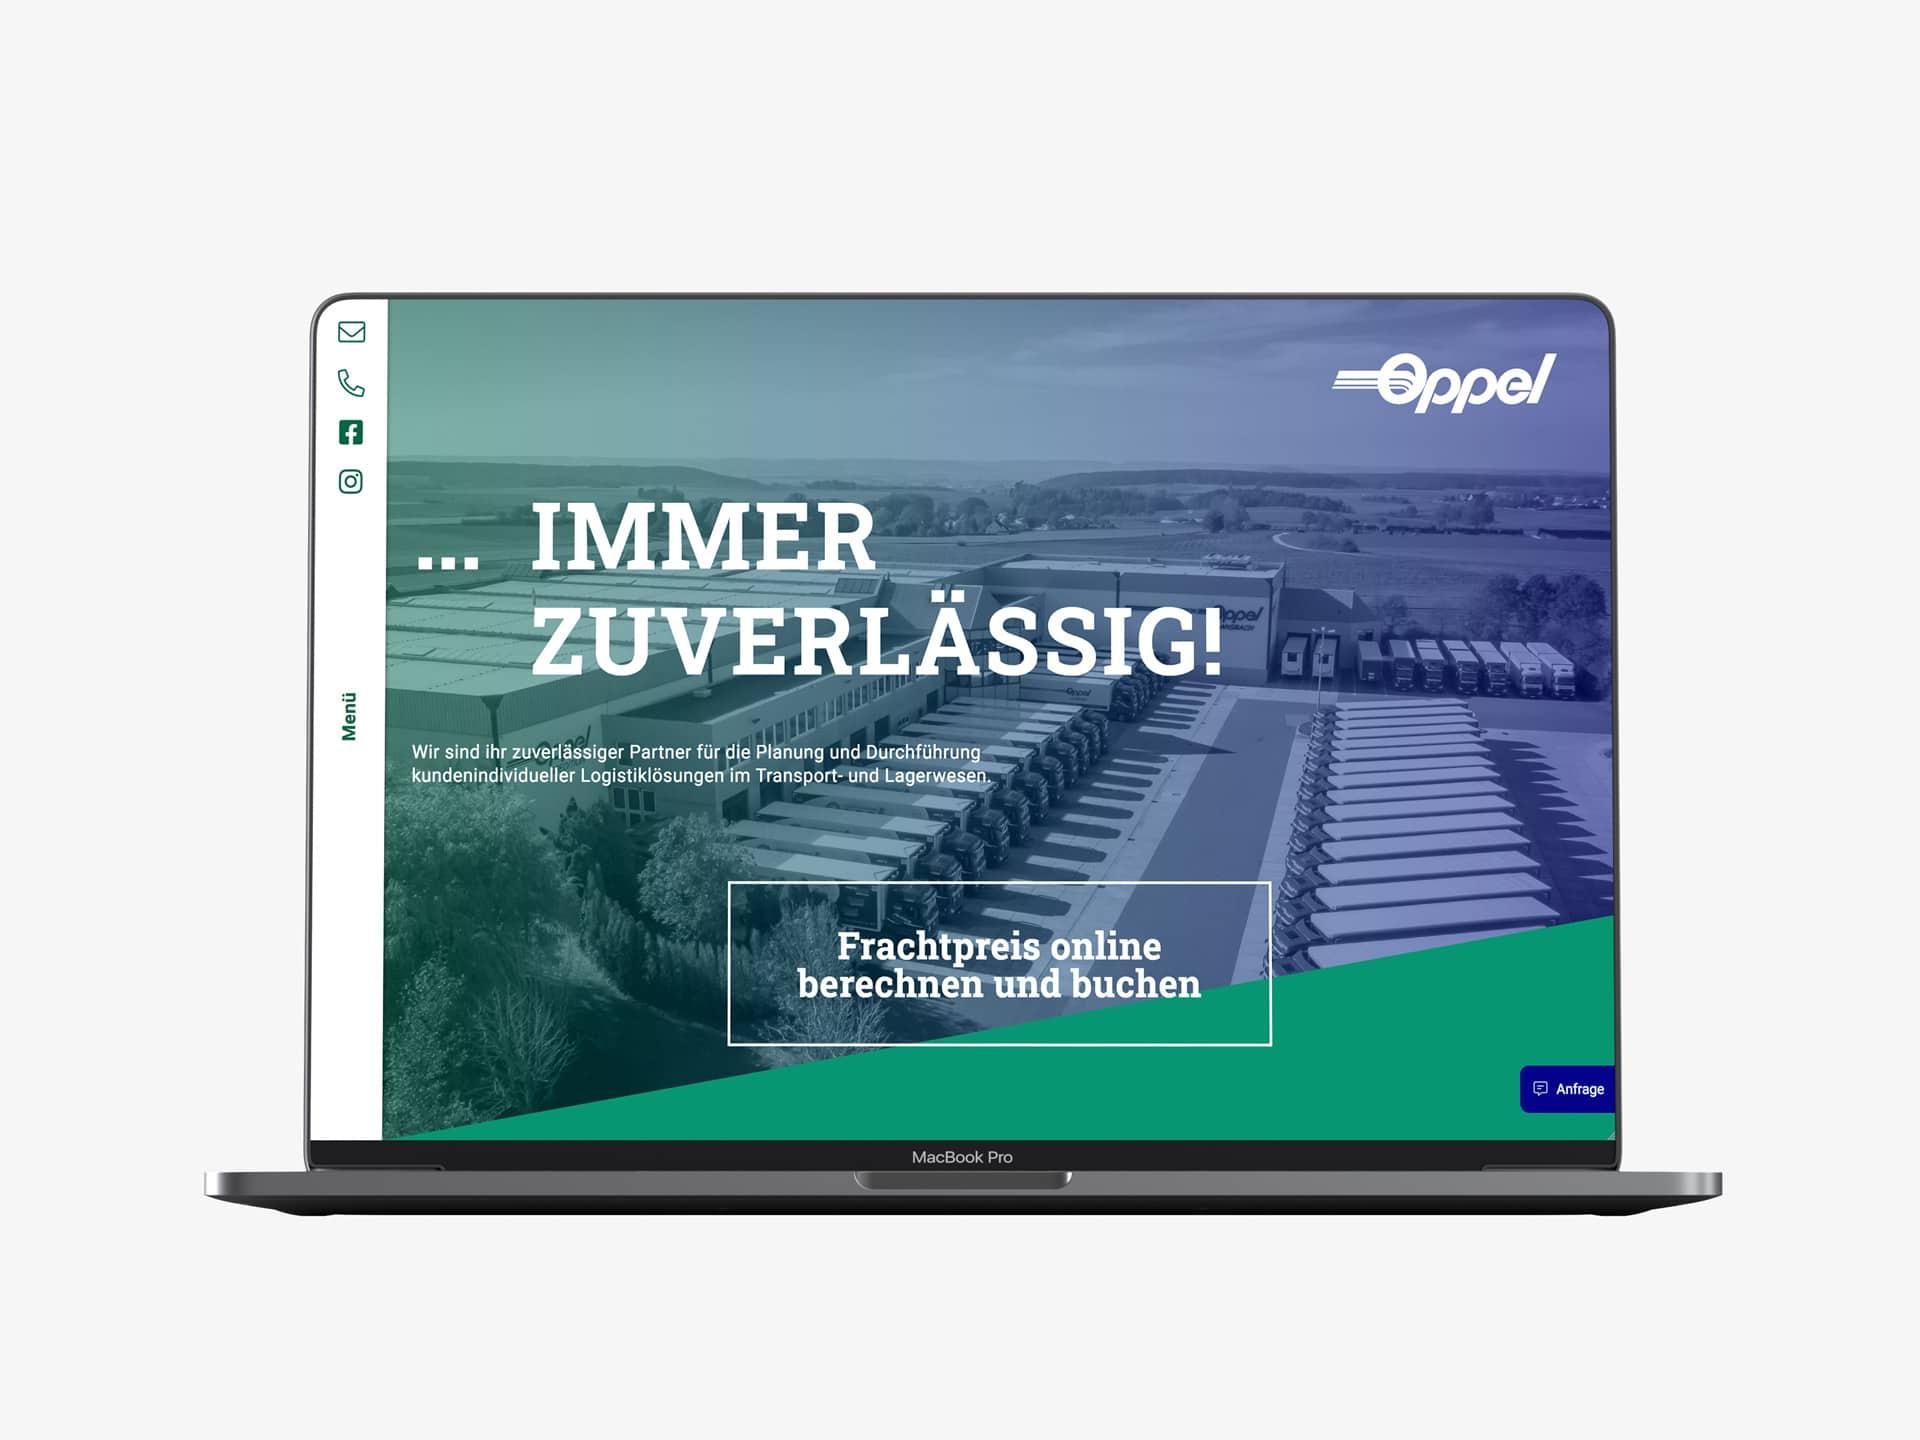 Desktop Screen Startseite Webdesign Spedition Oppel